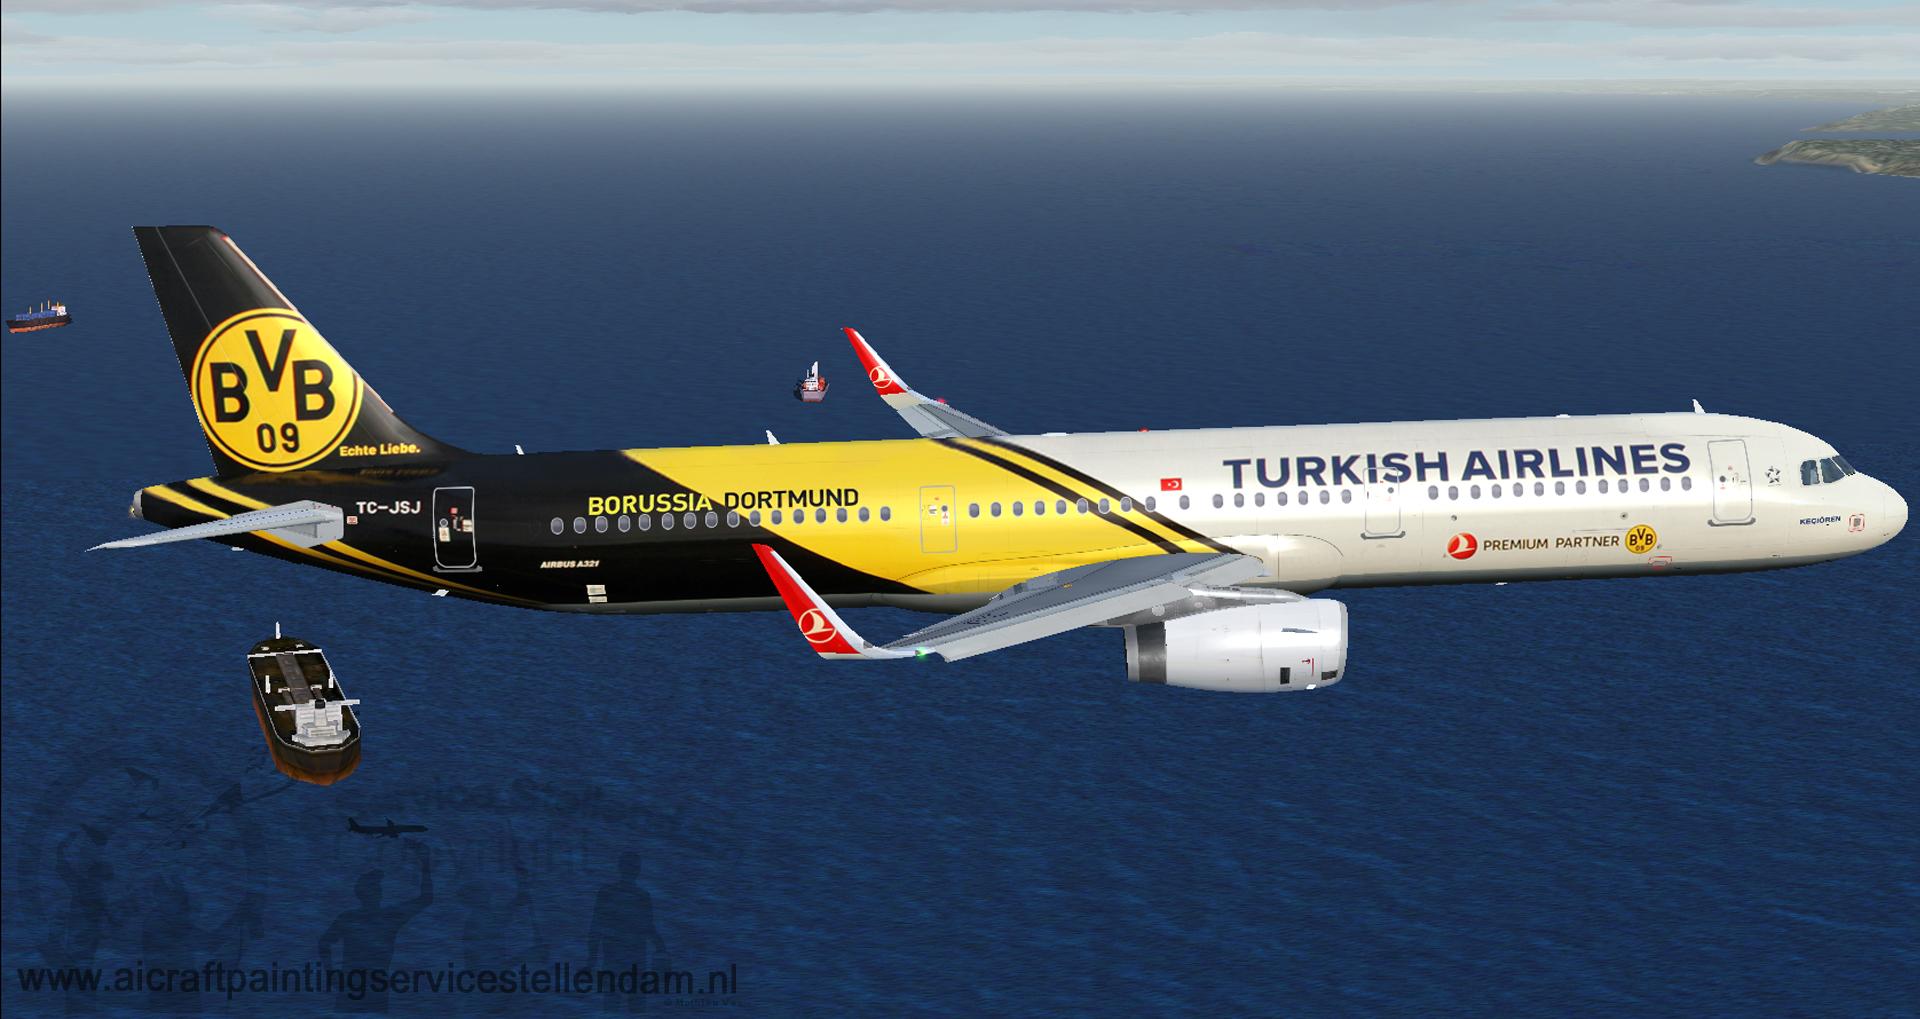 ProjectAirbusA321-231TurkishAirlines_BorussiaDortmund_TC-JSJ4